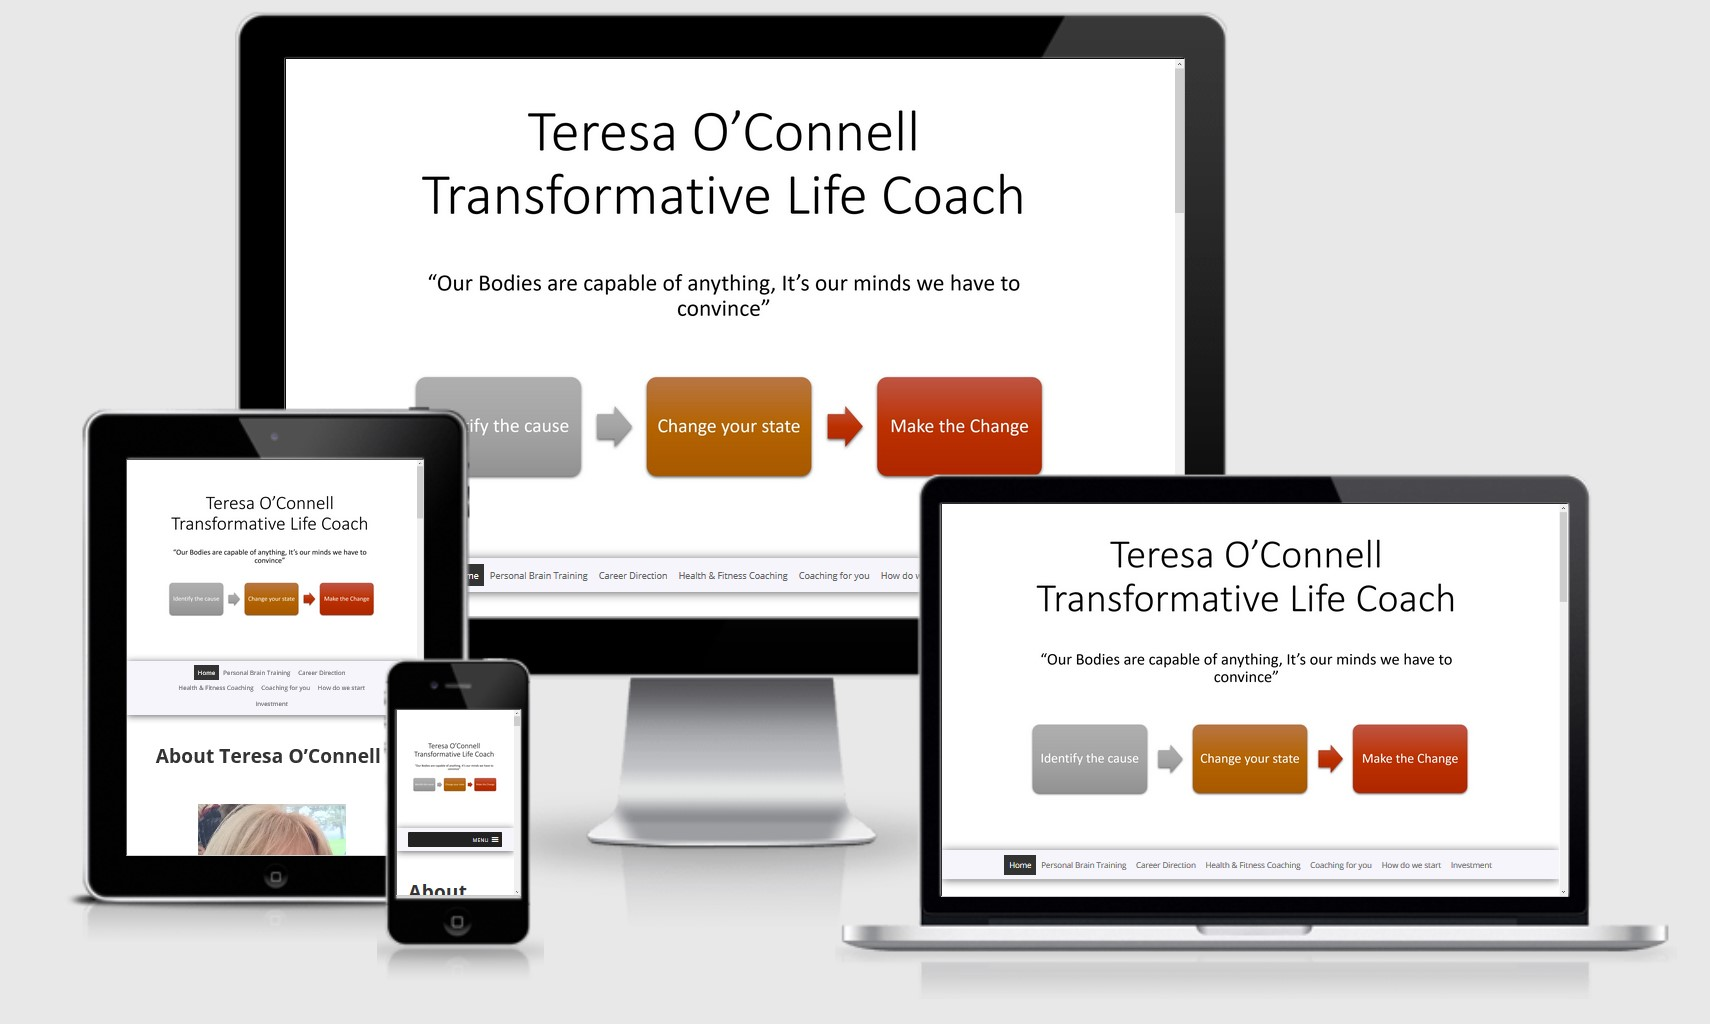 Teresa O'Connell Transformative Life Coach Website